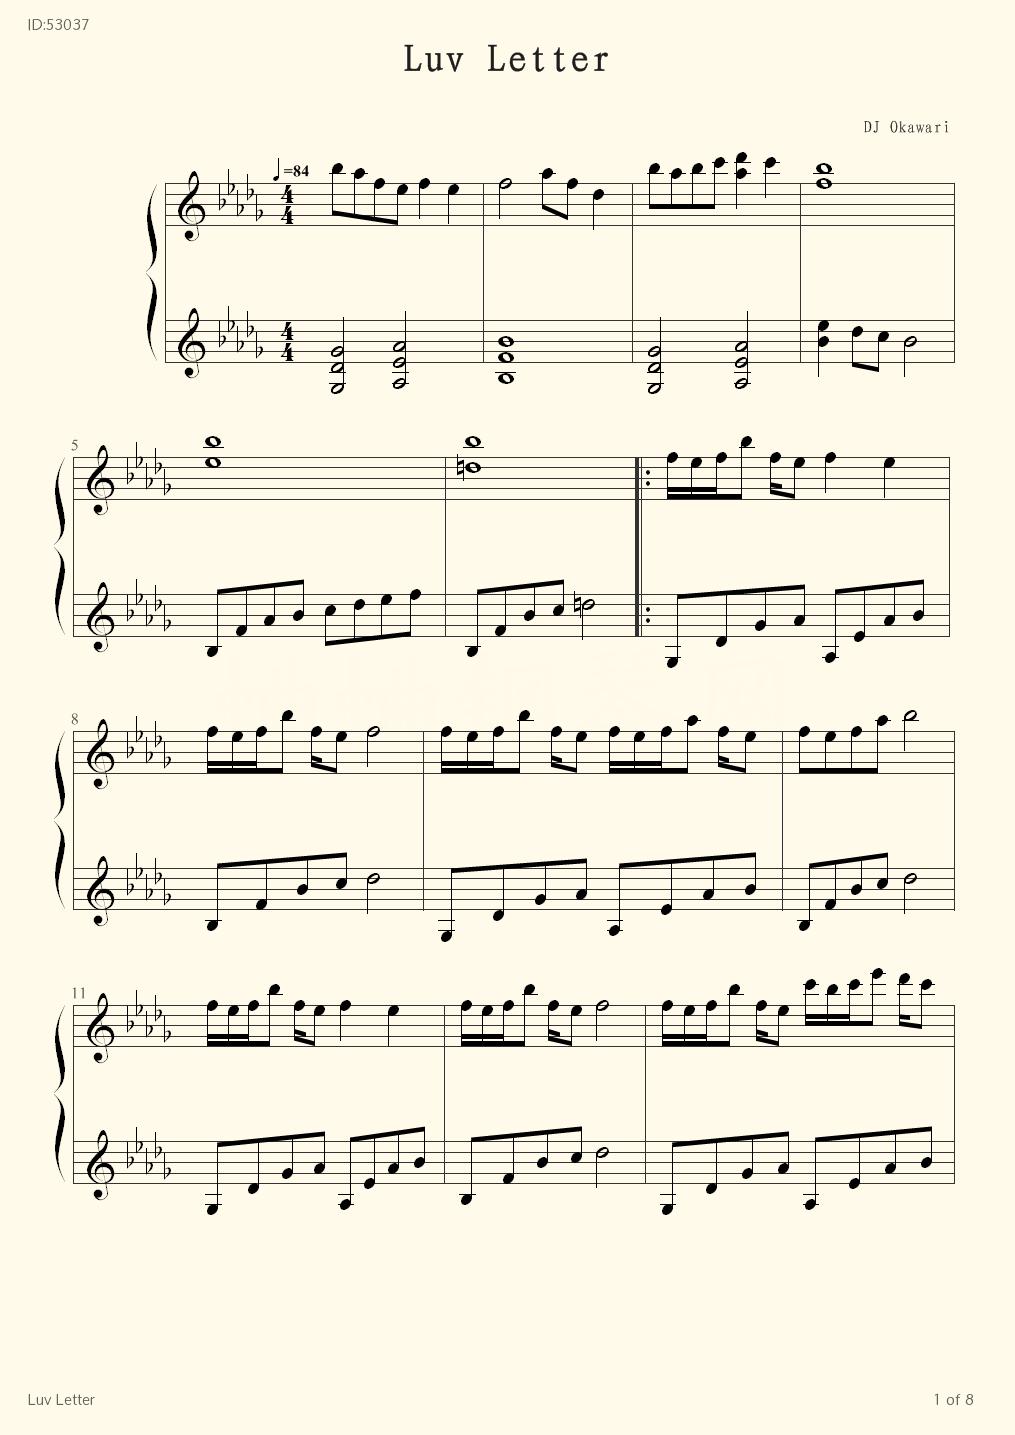 Luv Letter - Dj Okawari - first page